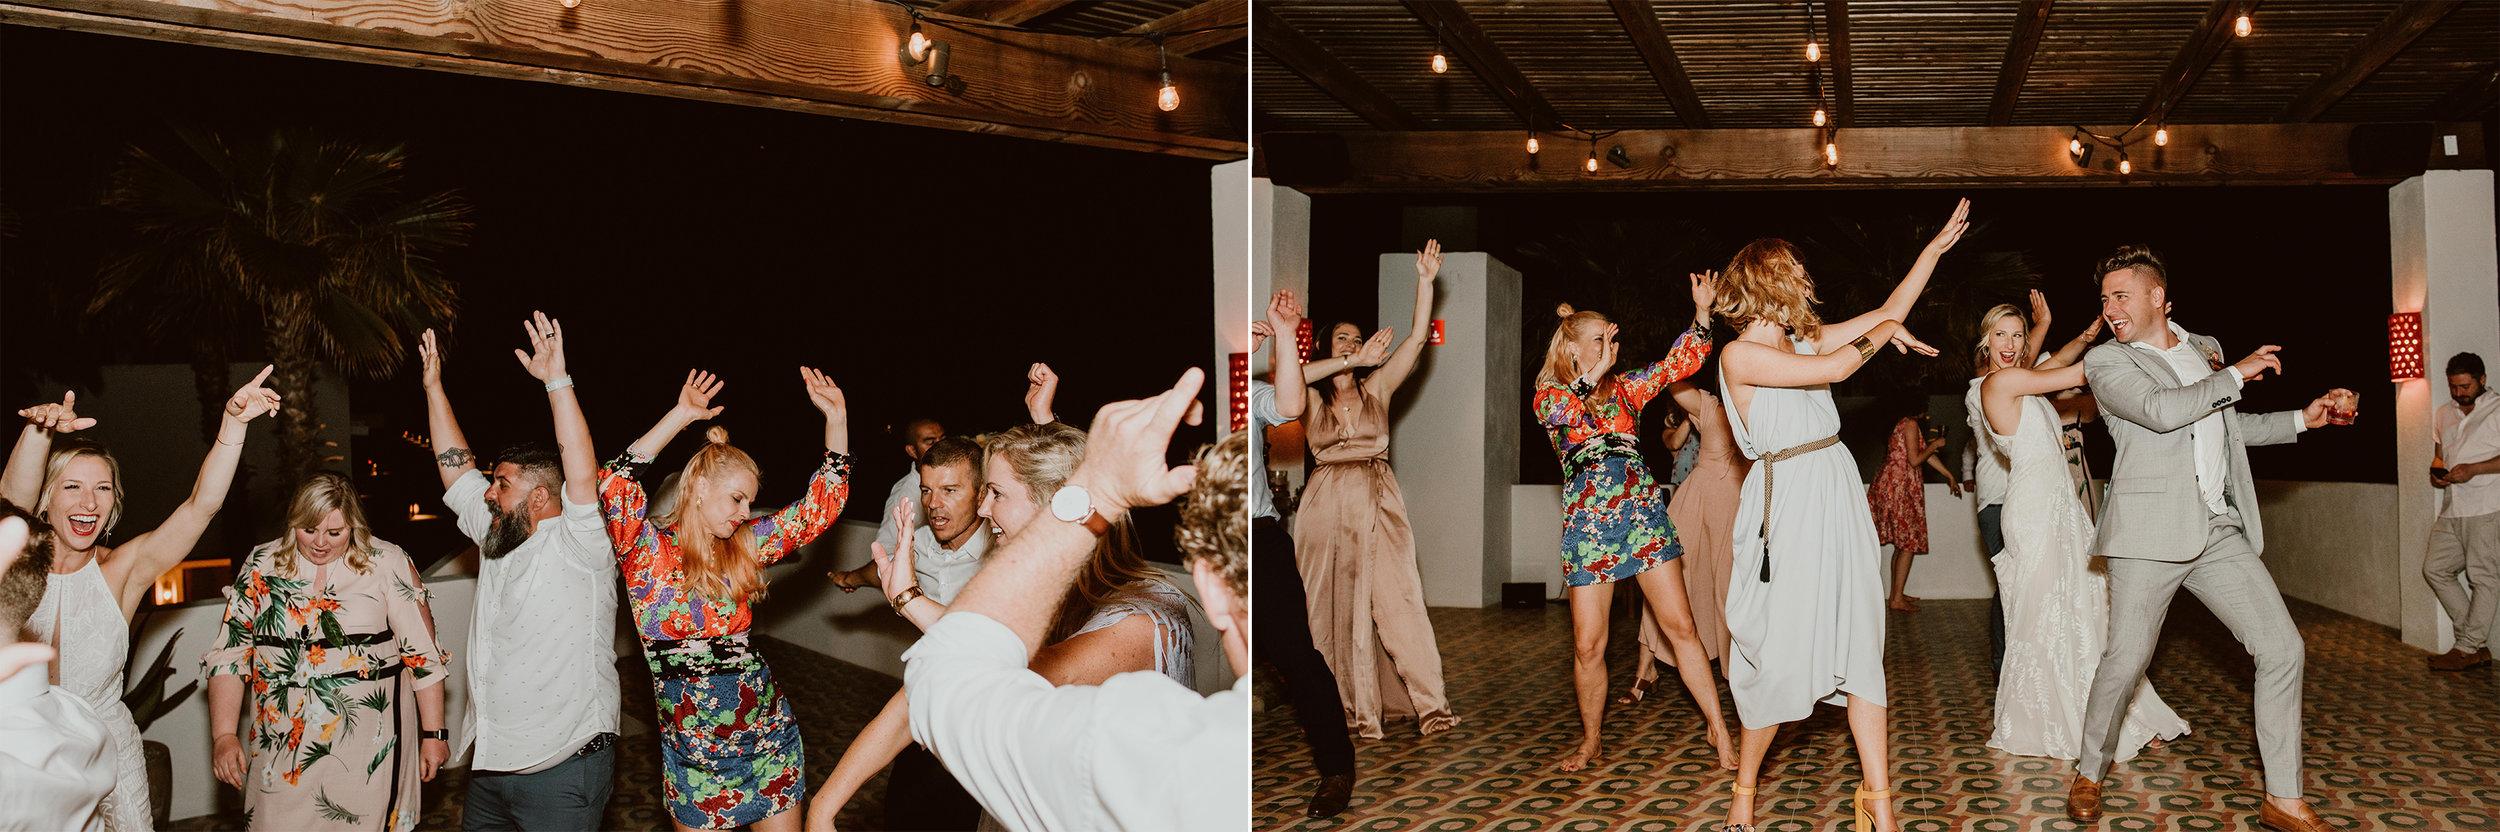 Lisa+Sam Hotel San Cristobal Wedding -561.jpg